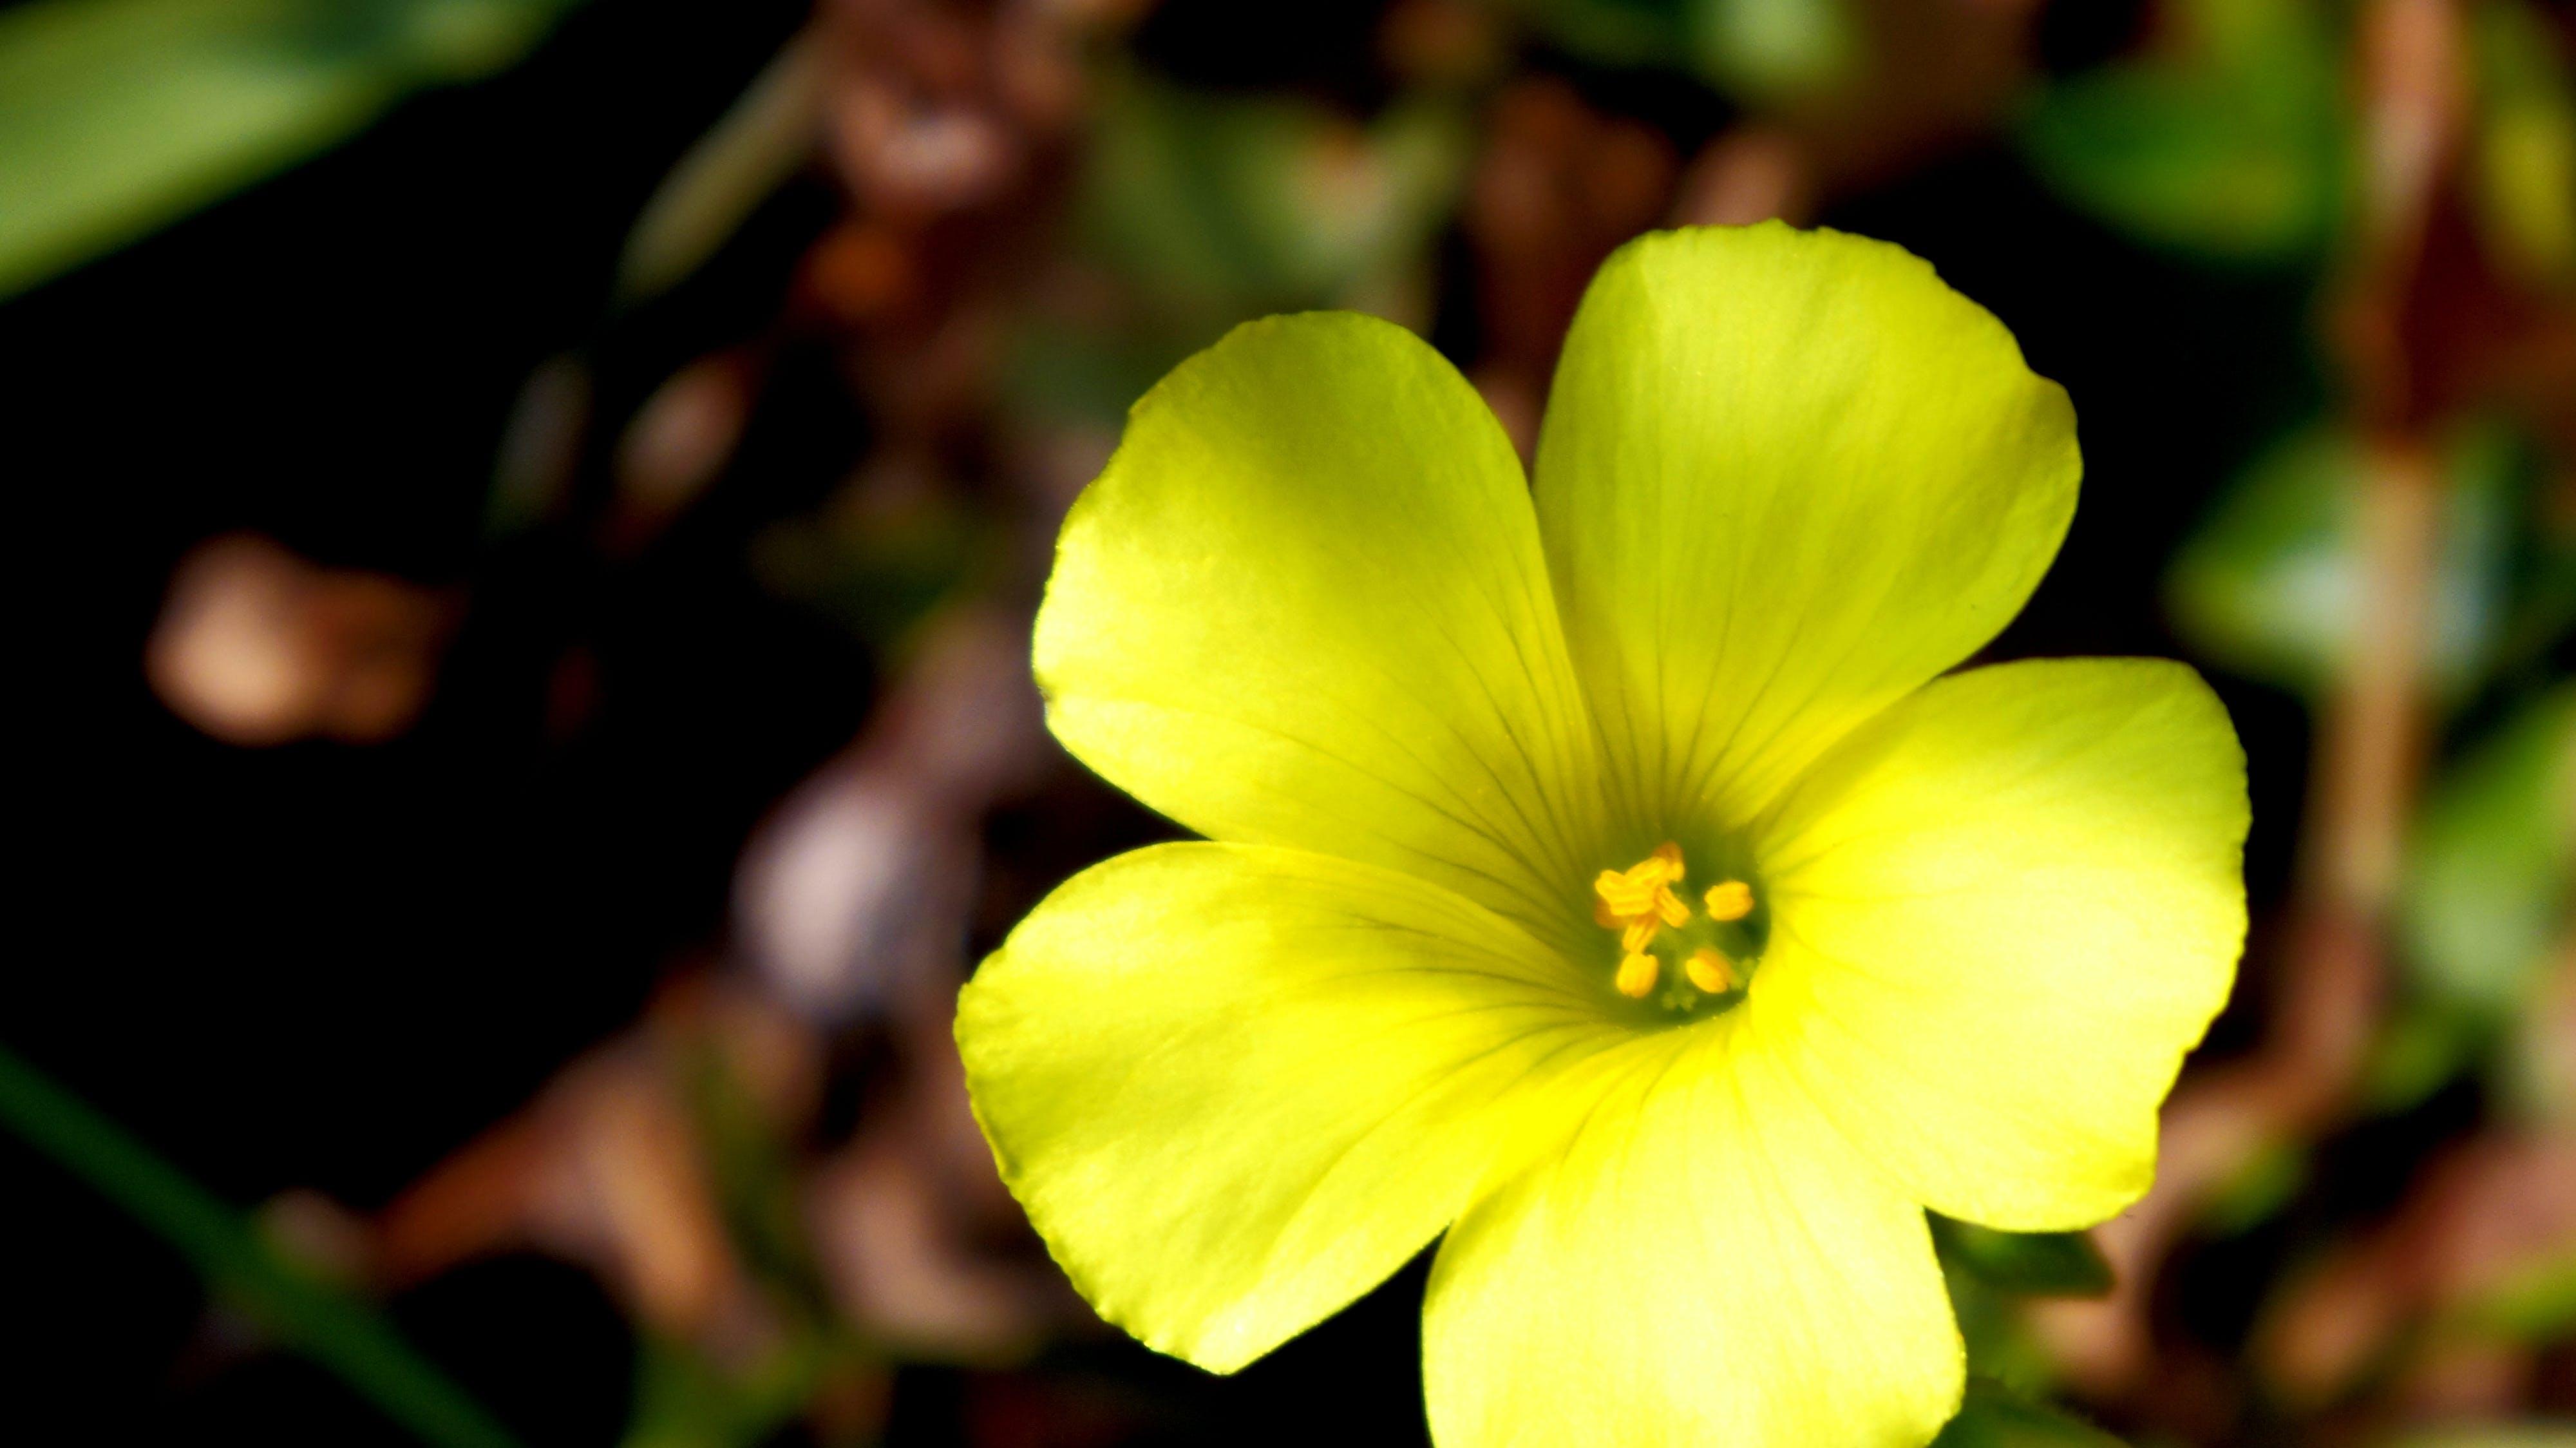 Free stock photo of flowers, yellow